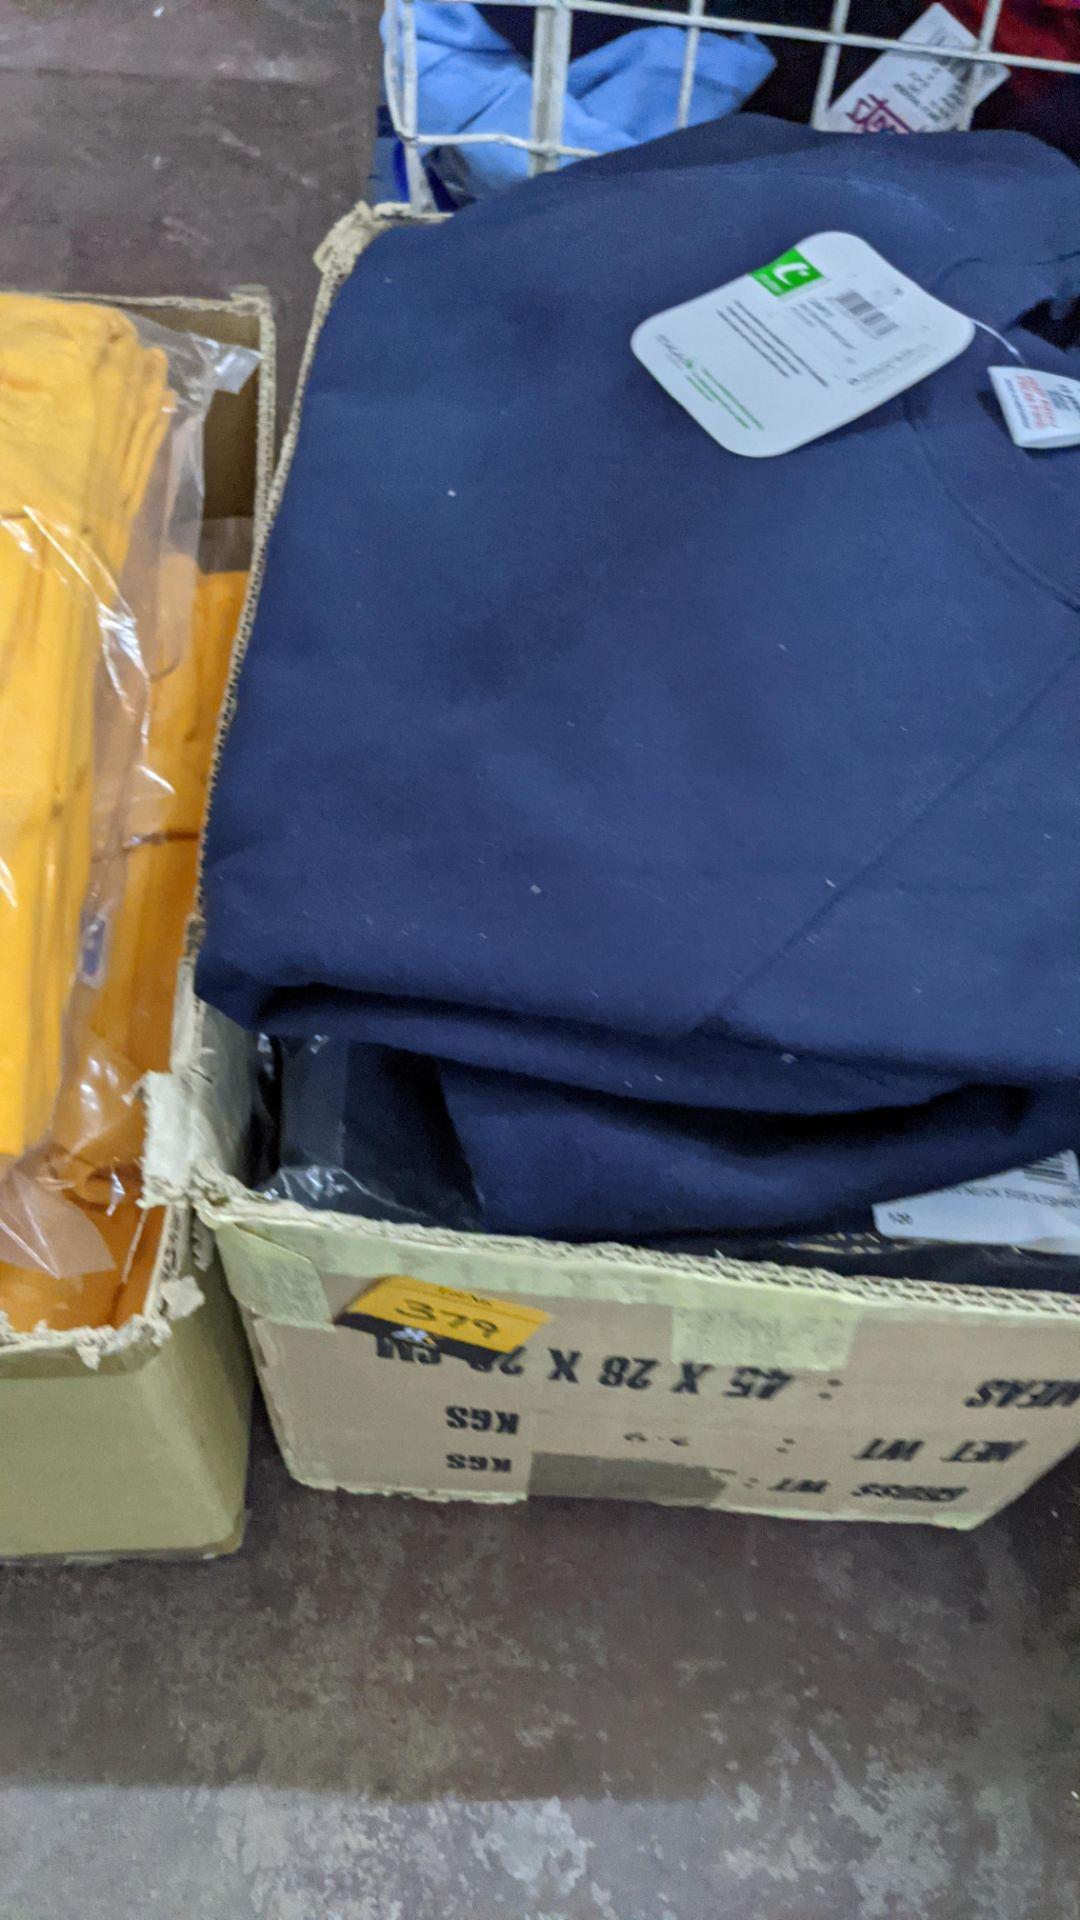 Approx 16 off assorted navy Trutex children's sweatshirts - Image 4 of 4